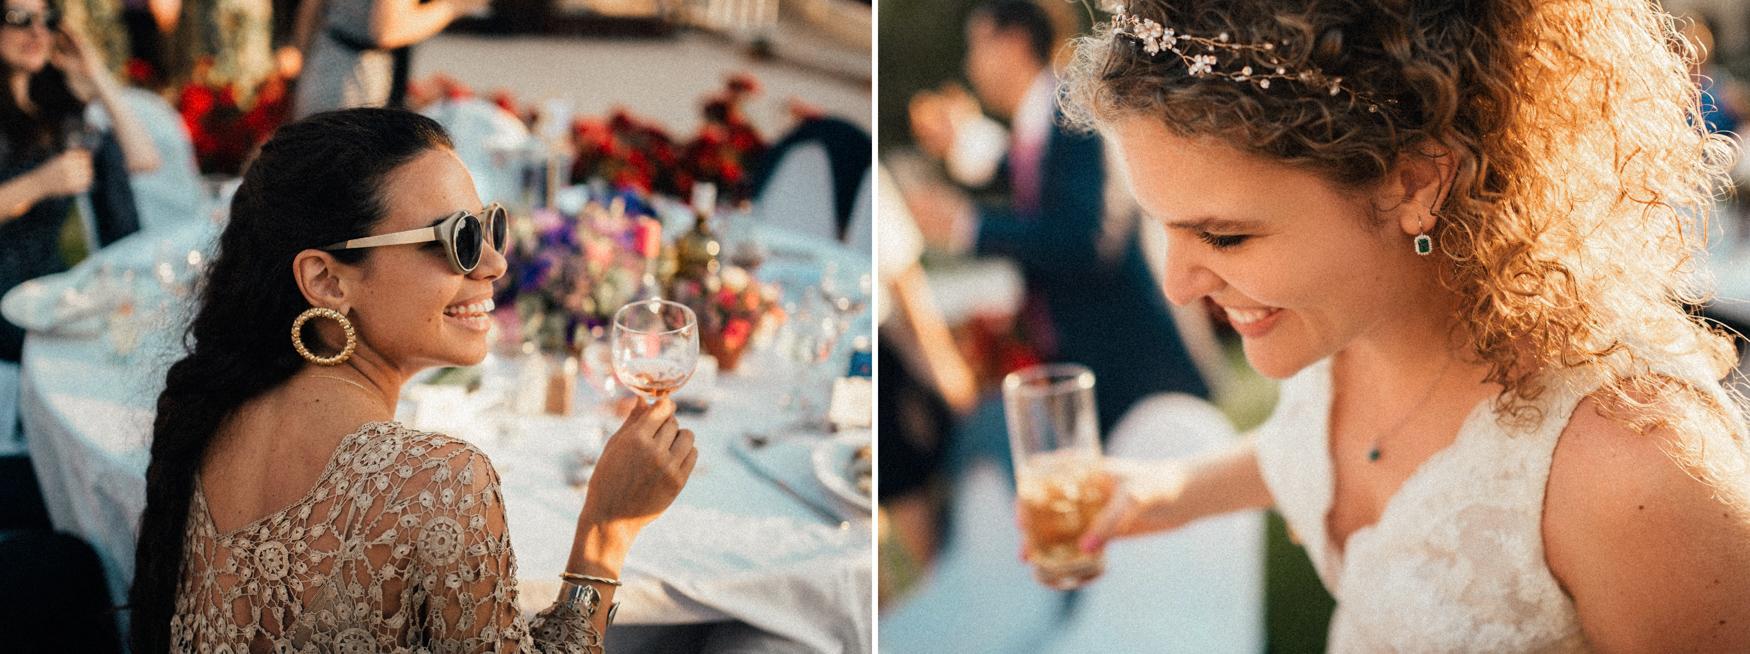 LR5 beirut lebanon mzaar intercontinental wedding photographer 014.jpg